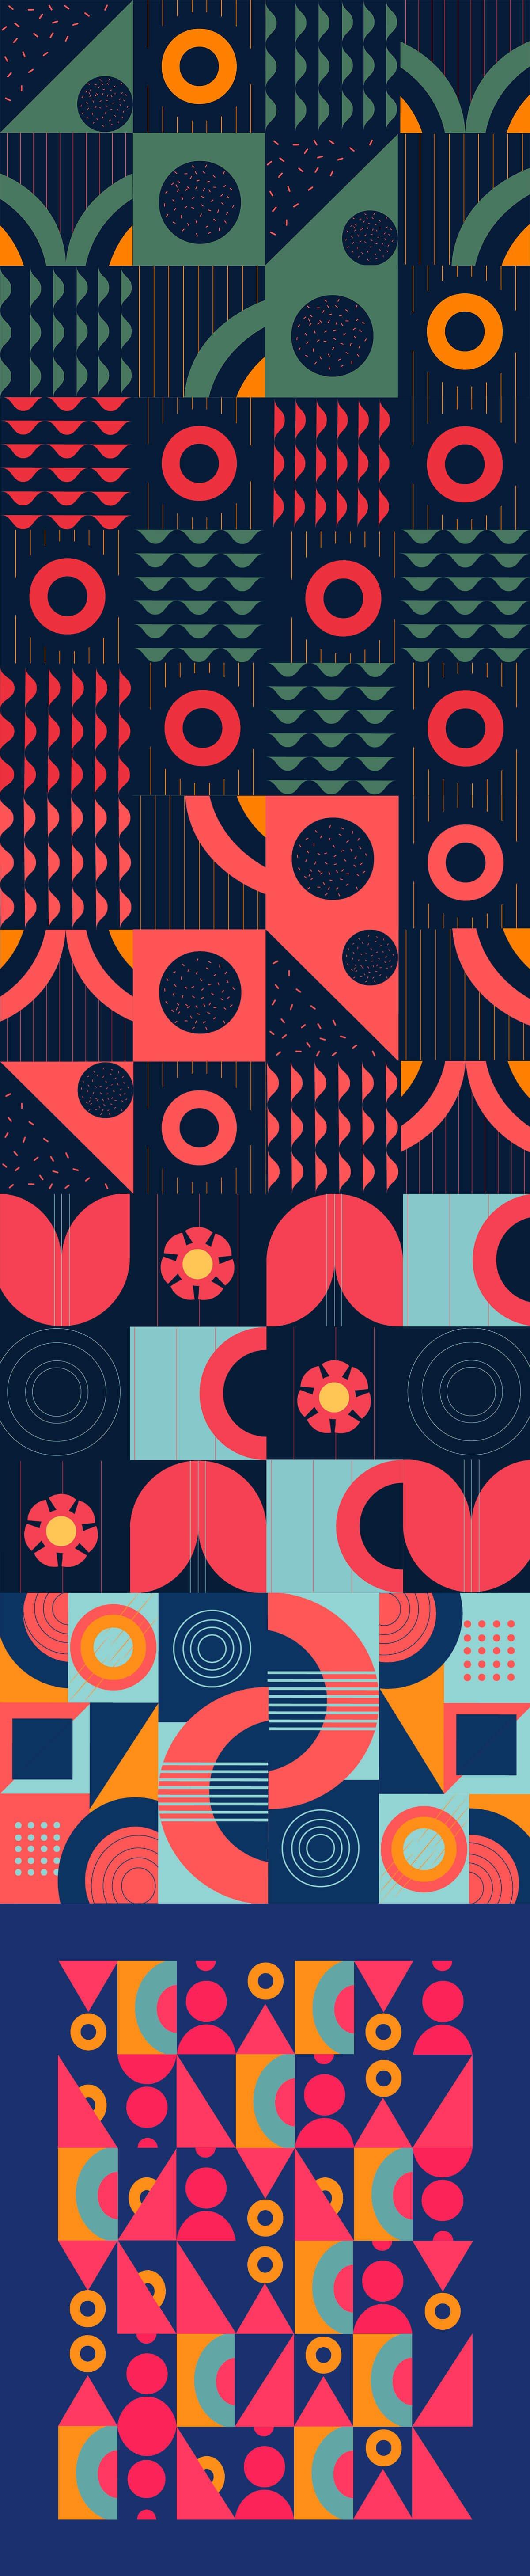 Abstract Poster by Sophie Tsankashvili